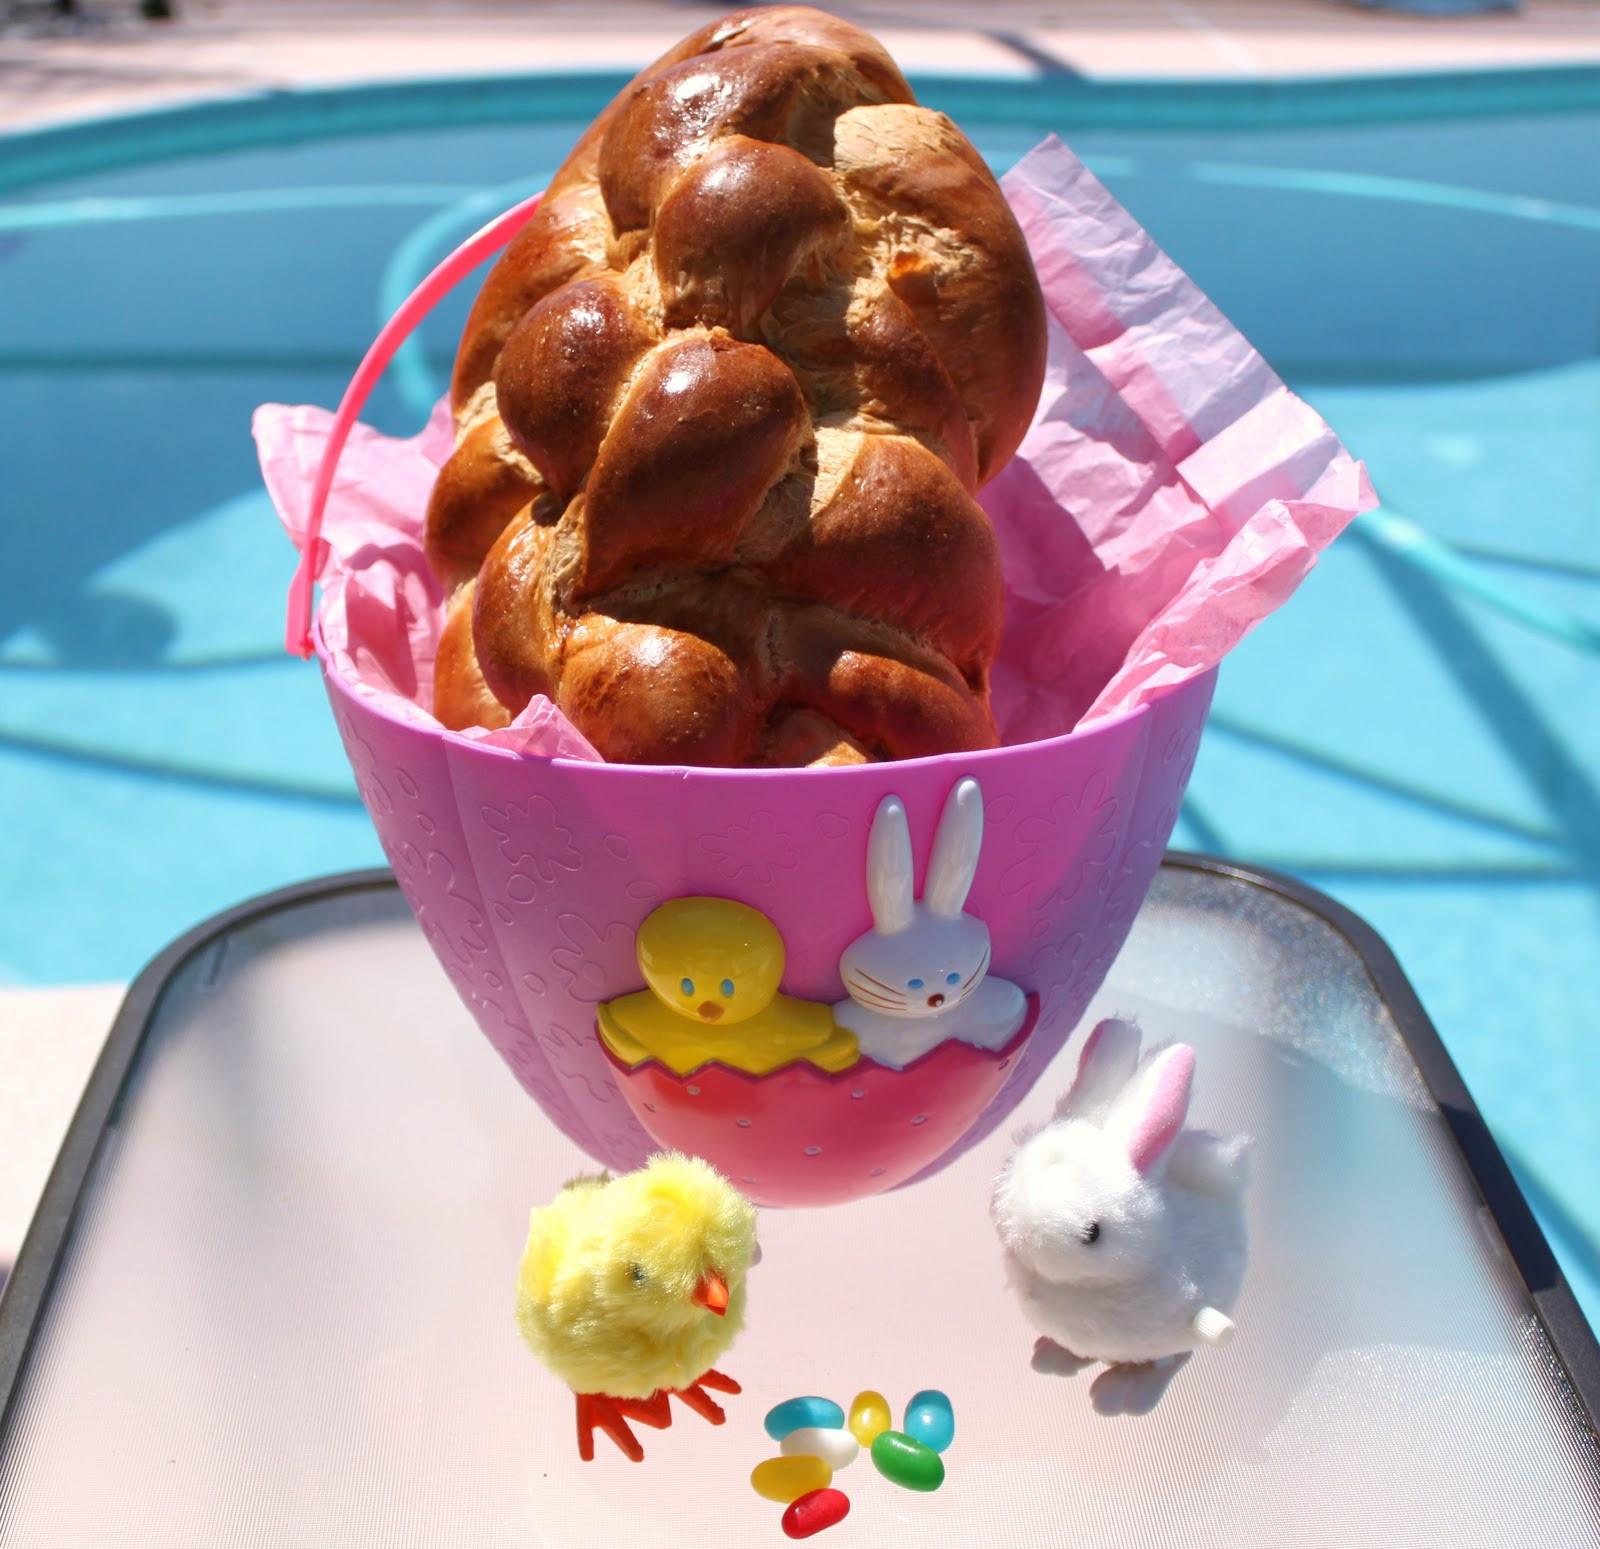 Italian Easter Dinner Traditions  Our Italian Traditional Easter Dinner